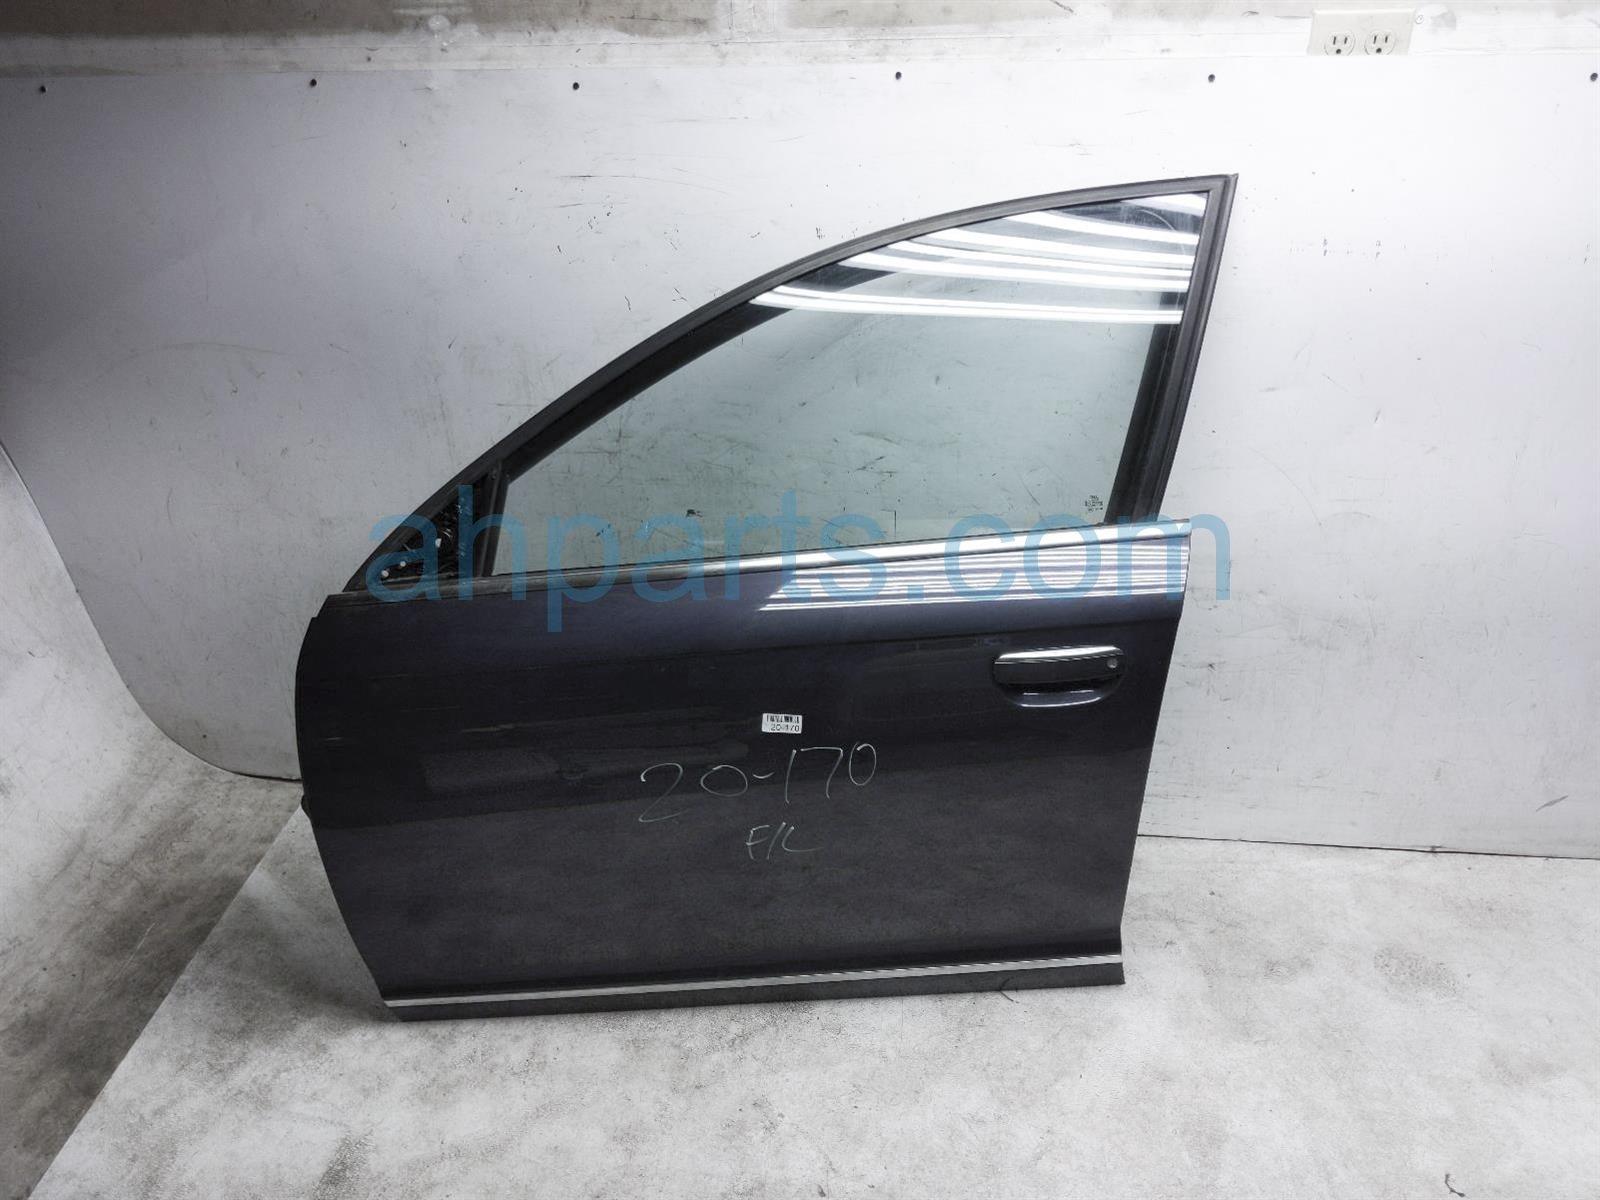 2011 Audi A6 Audi Front Driver Door   Blue   No Mirror/trim 4F0 831 051 F Replacement